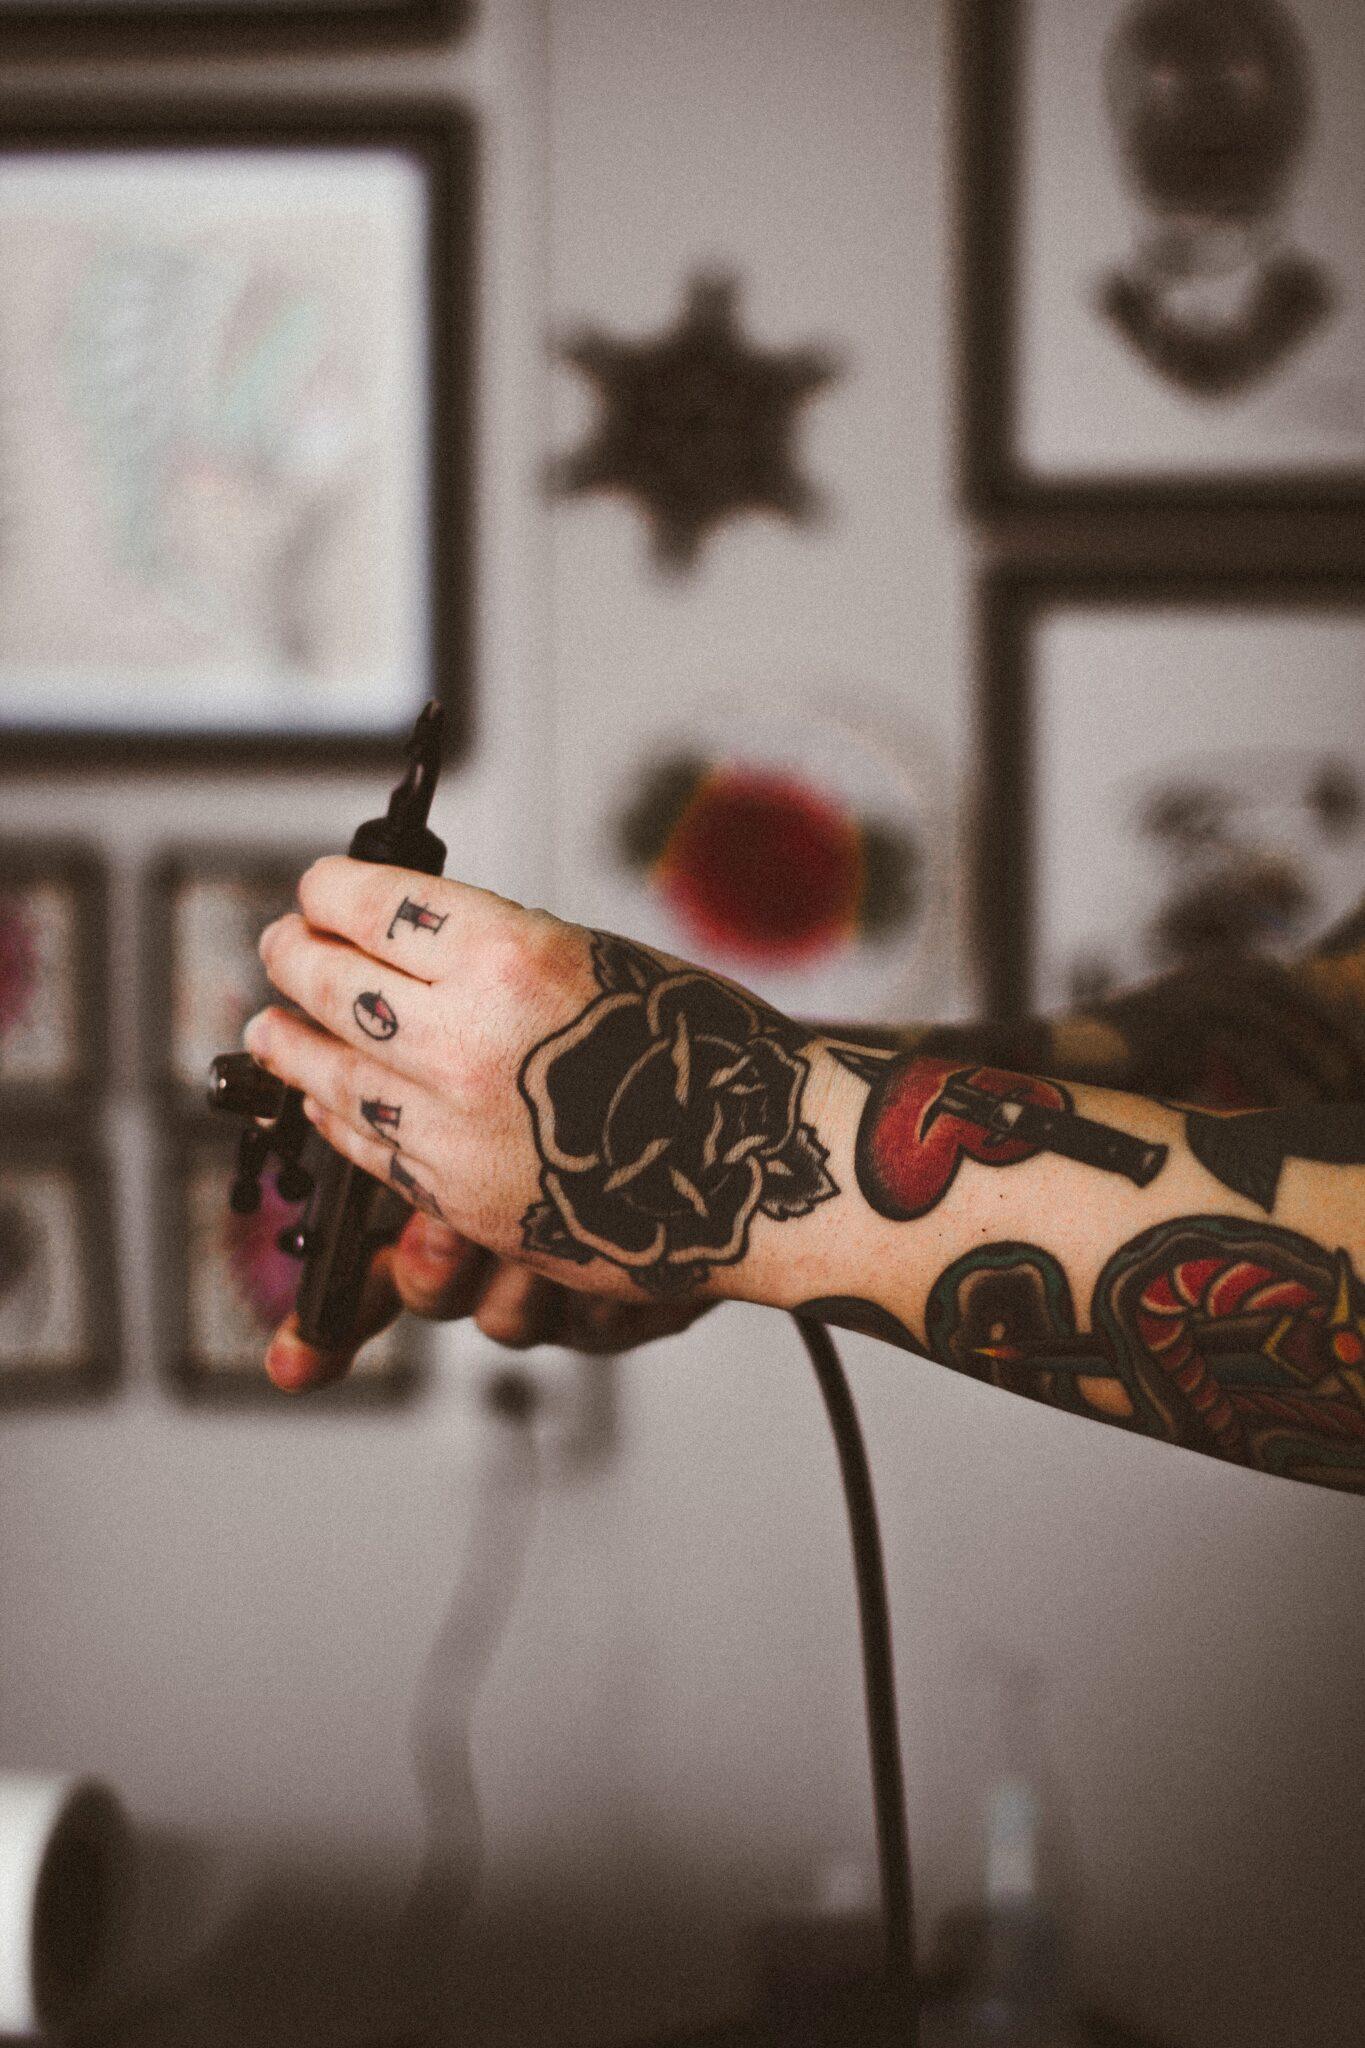 A tattooist working. Discover the best tattoo artists.